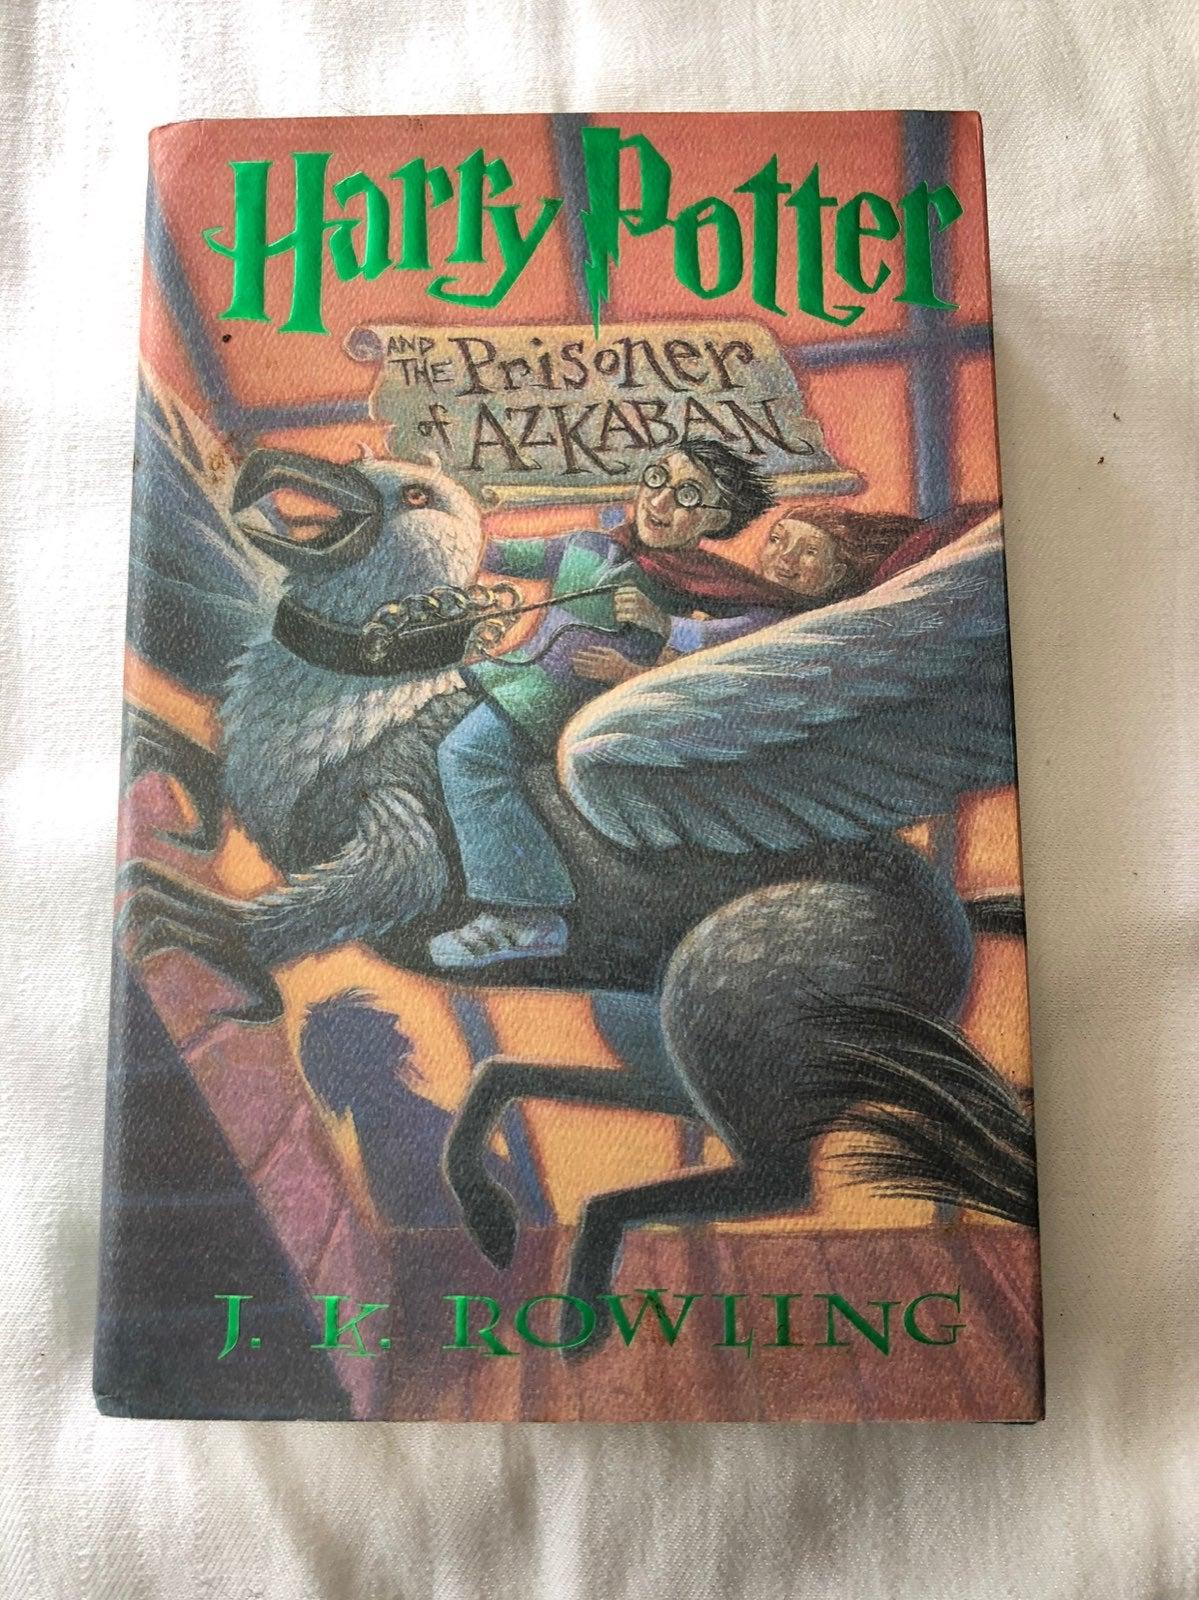 Harry Potter Hardback Prisoner of Azkaba